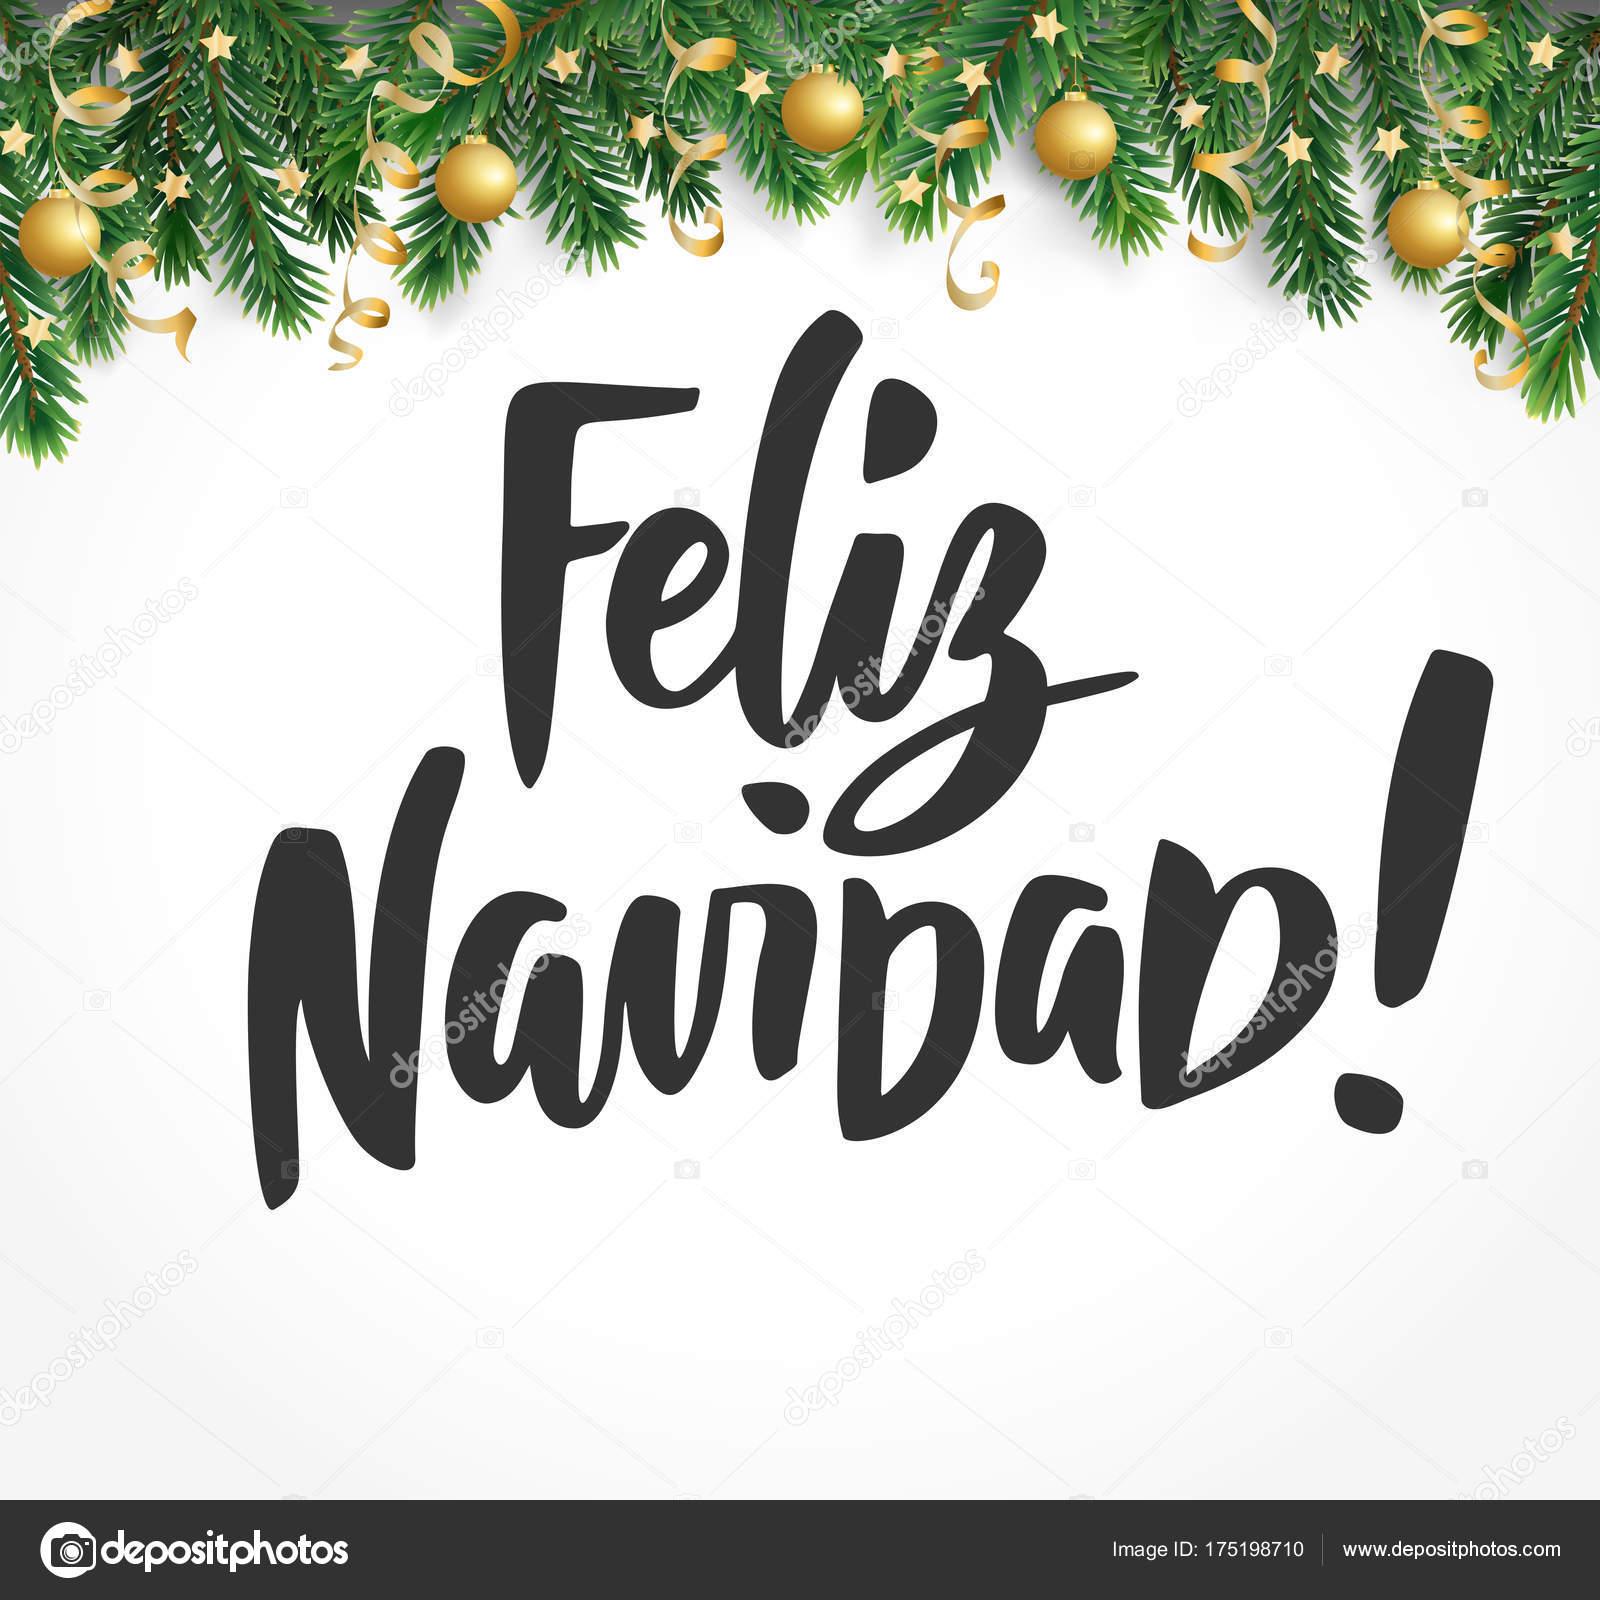 Feliz Navidad Rotulos.Feliz Navidad Text Holiday Greetings Spanish Quote Fir